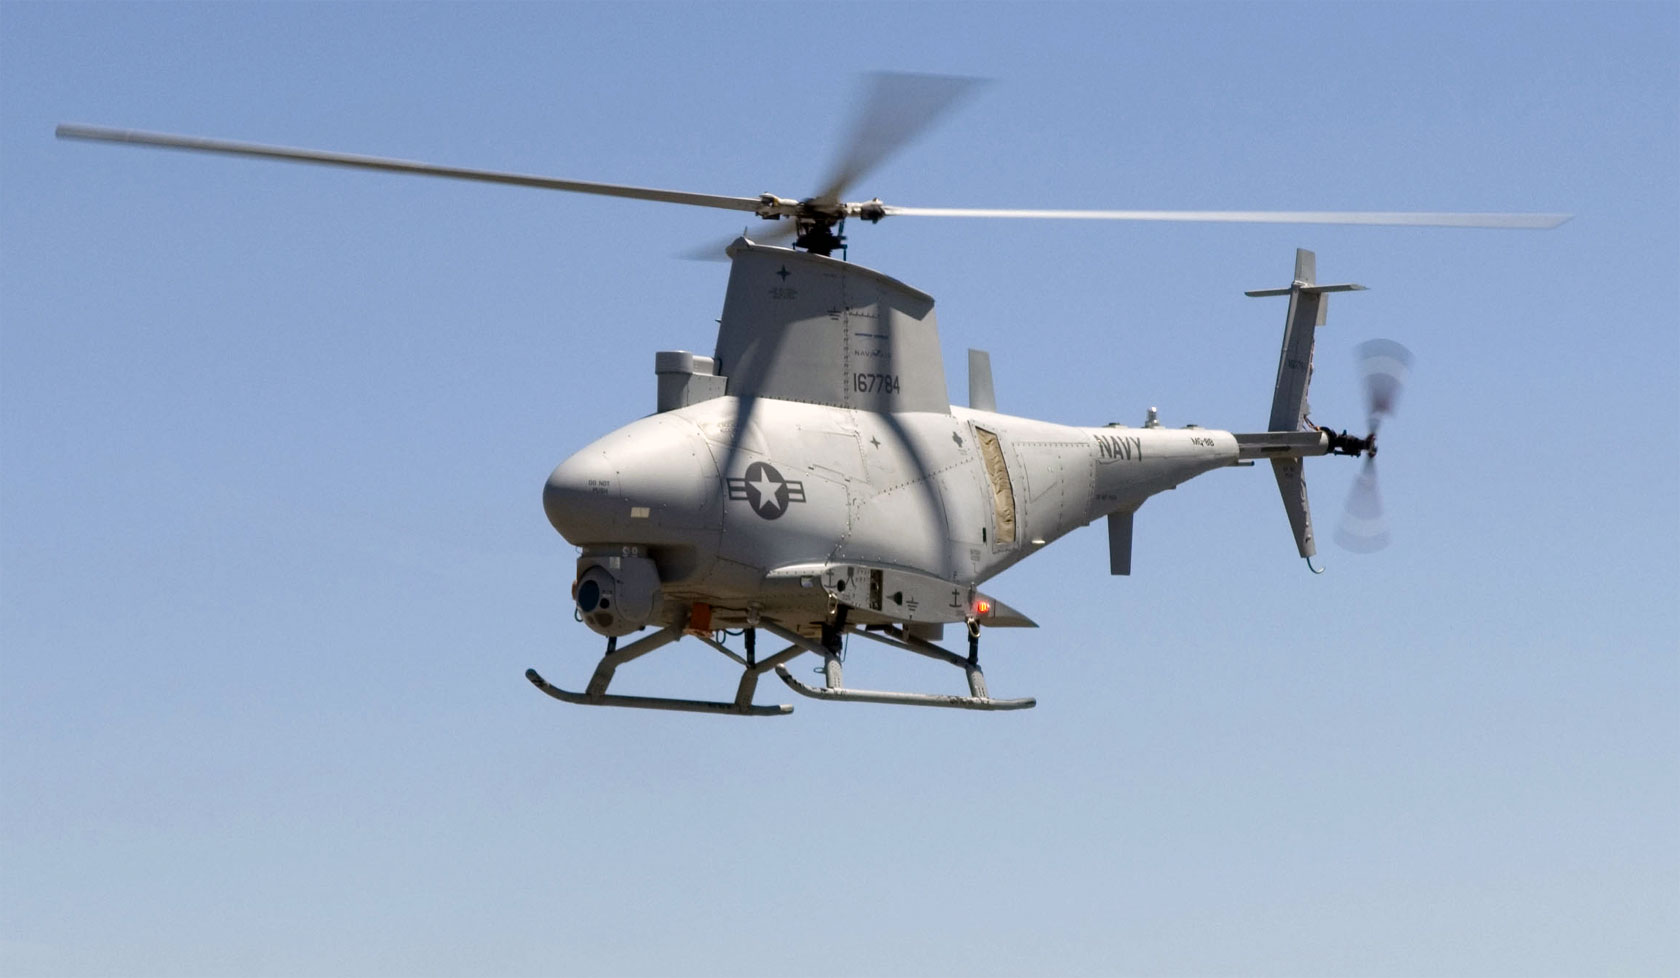 RAFs MQ-9 Reaper Unmanned Aerial Vehicle (UAV) in